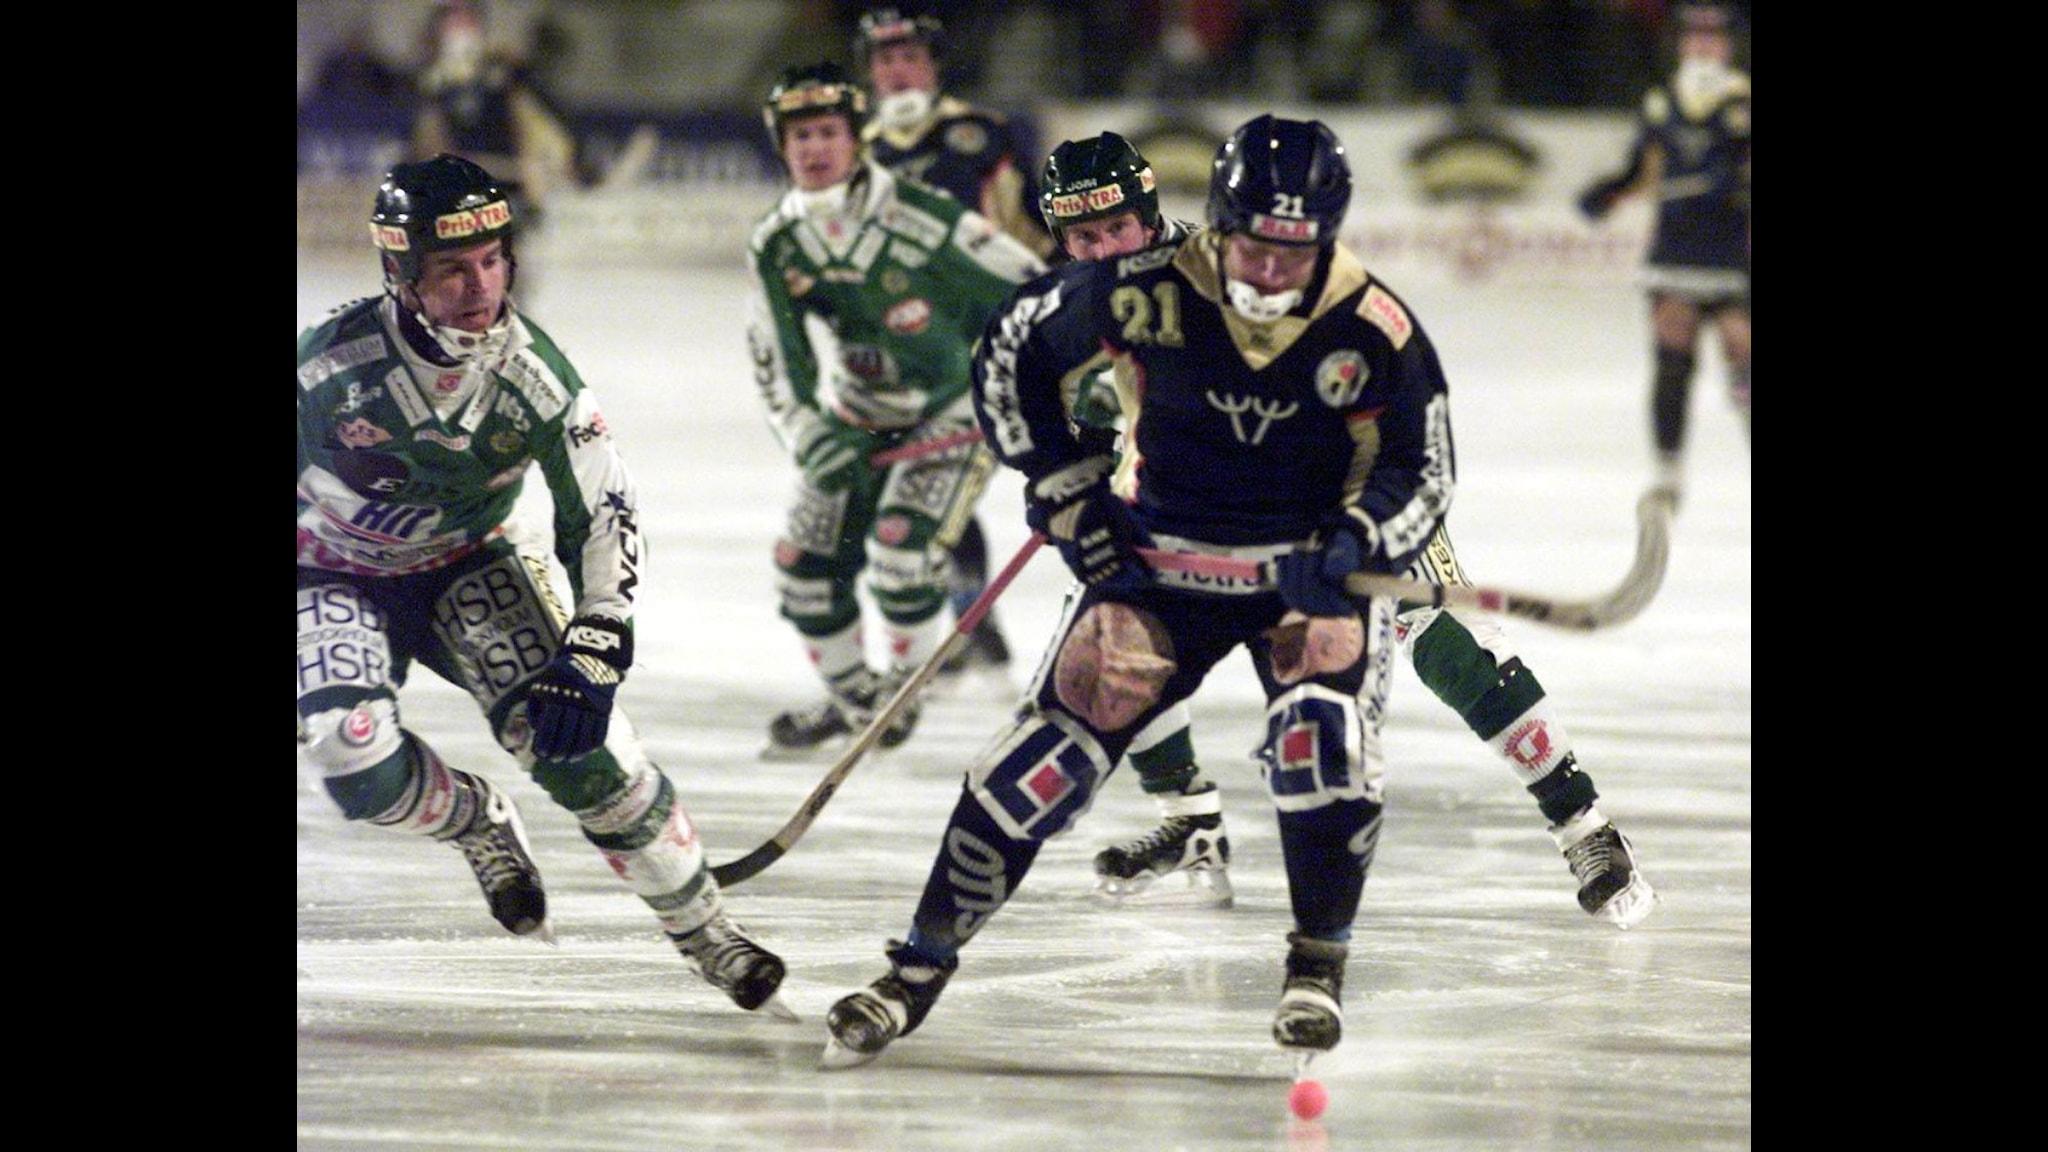 Spelare i IF Boltic under en match i blåa dressar. Foto: SCANPIX